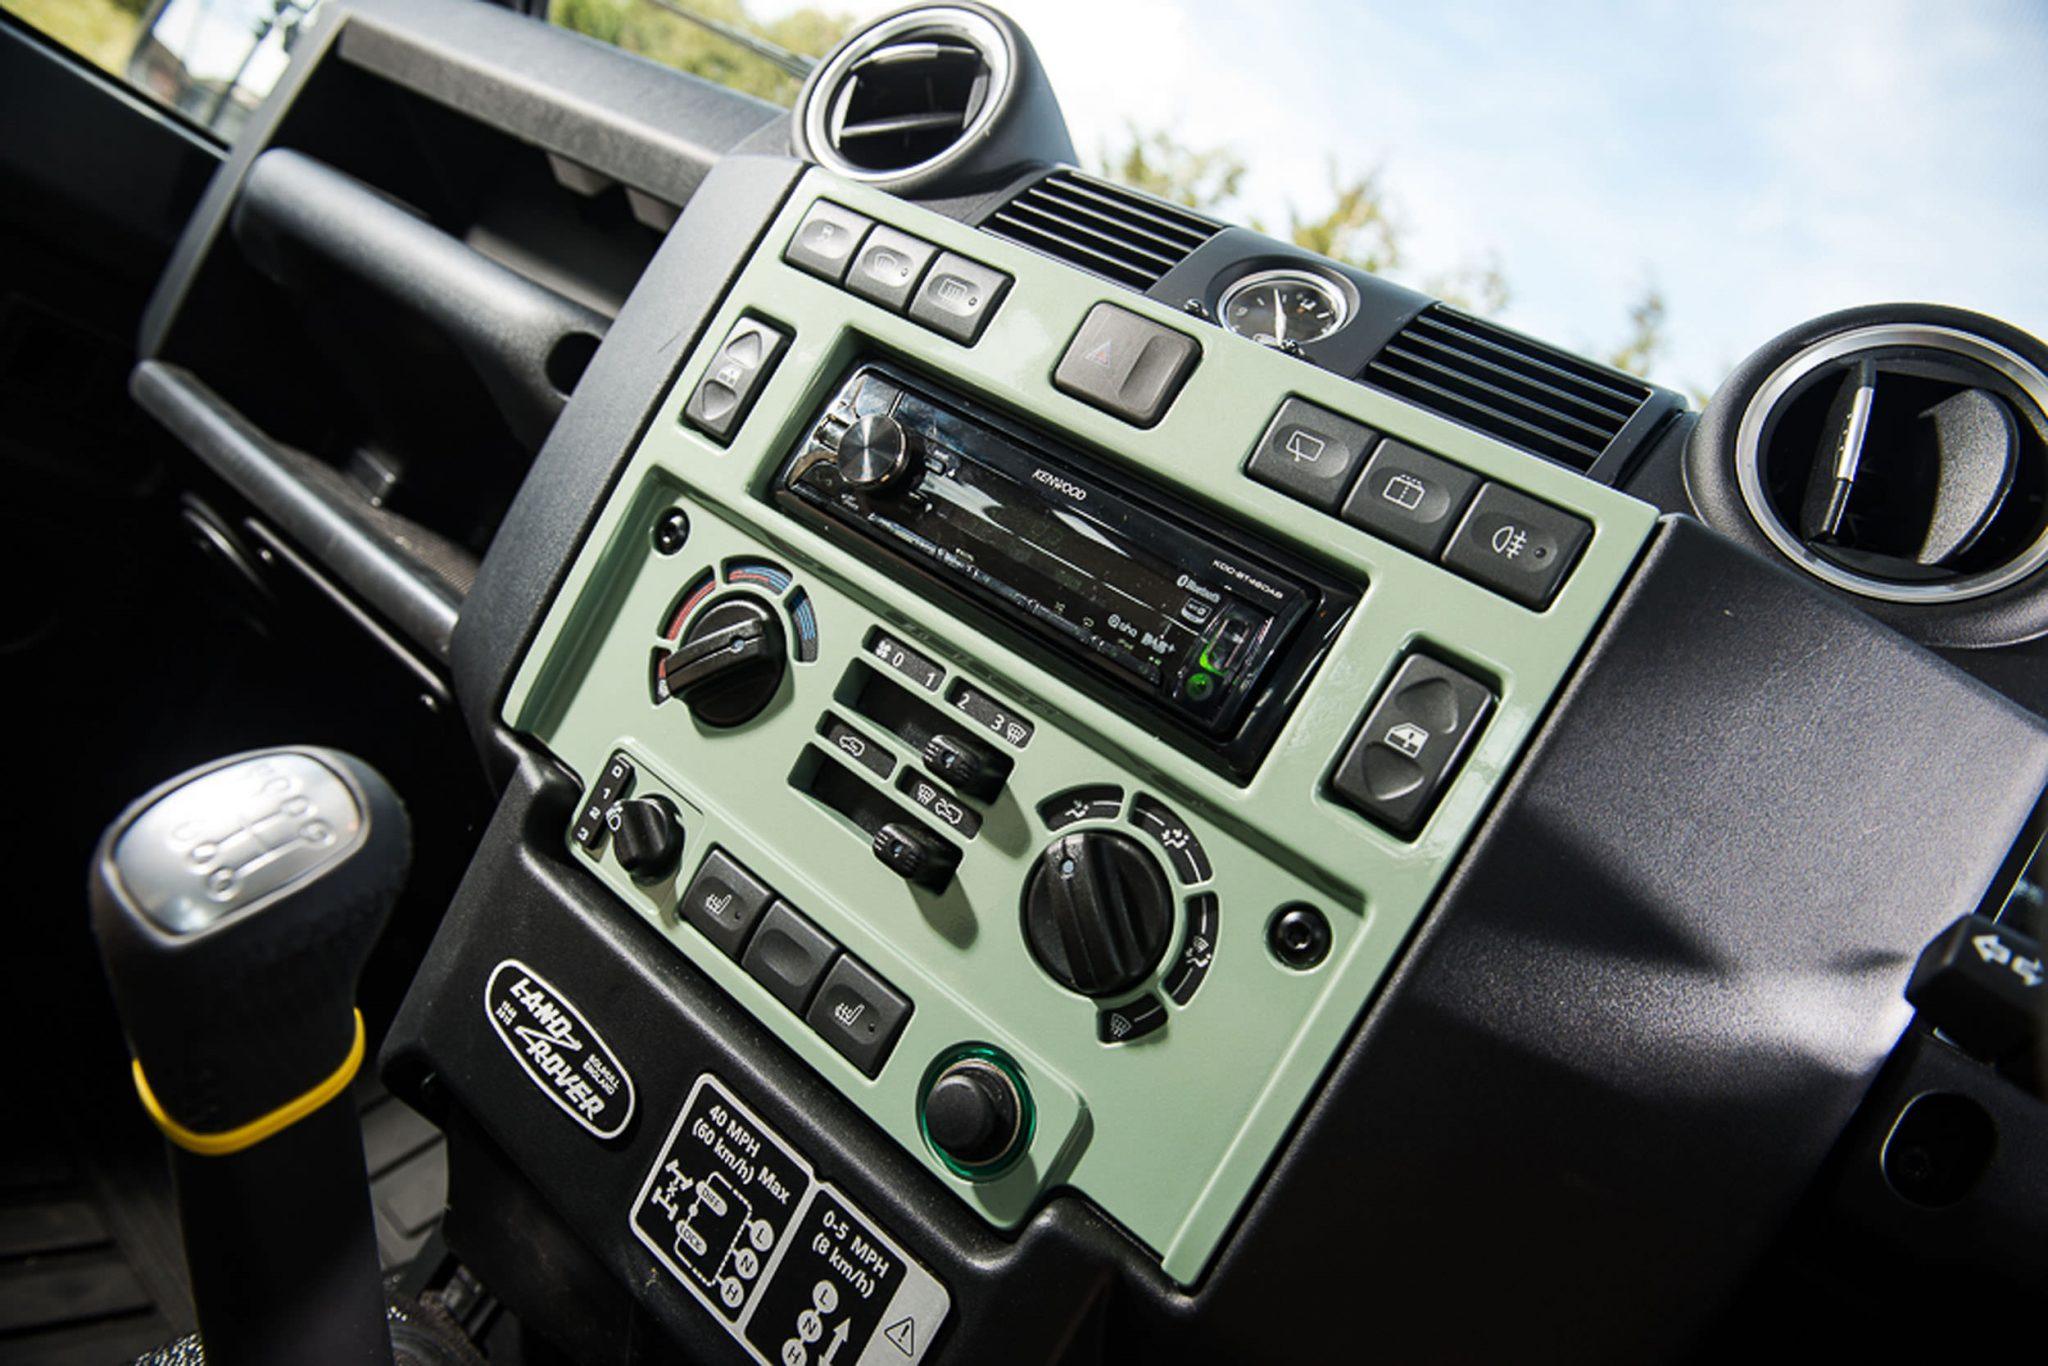 Rowan Atkinson's Land Rover Defender 9 - Rowan Atkinson's Land Rover Defender